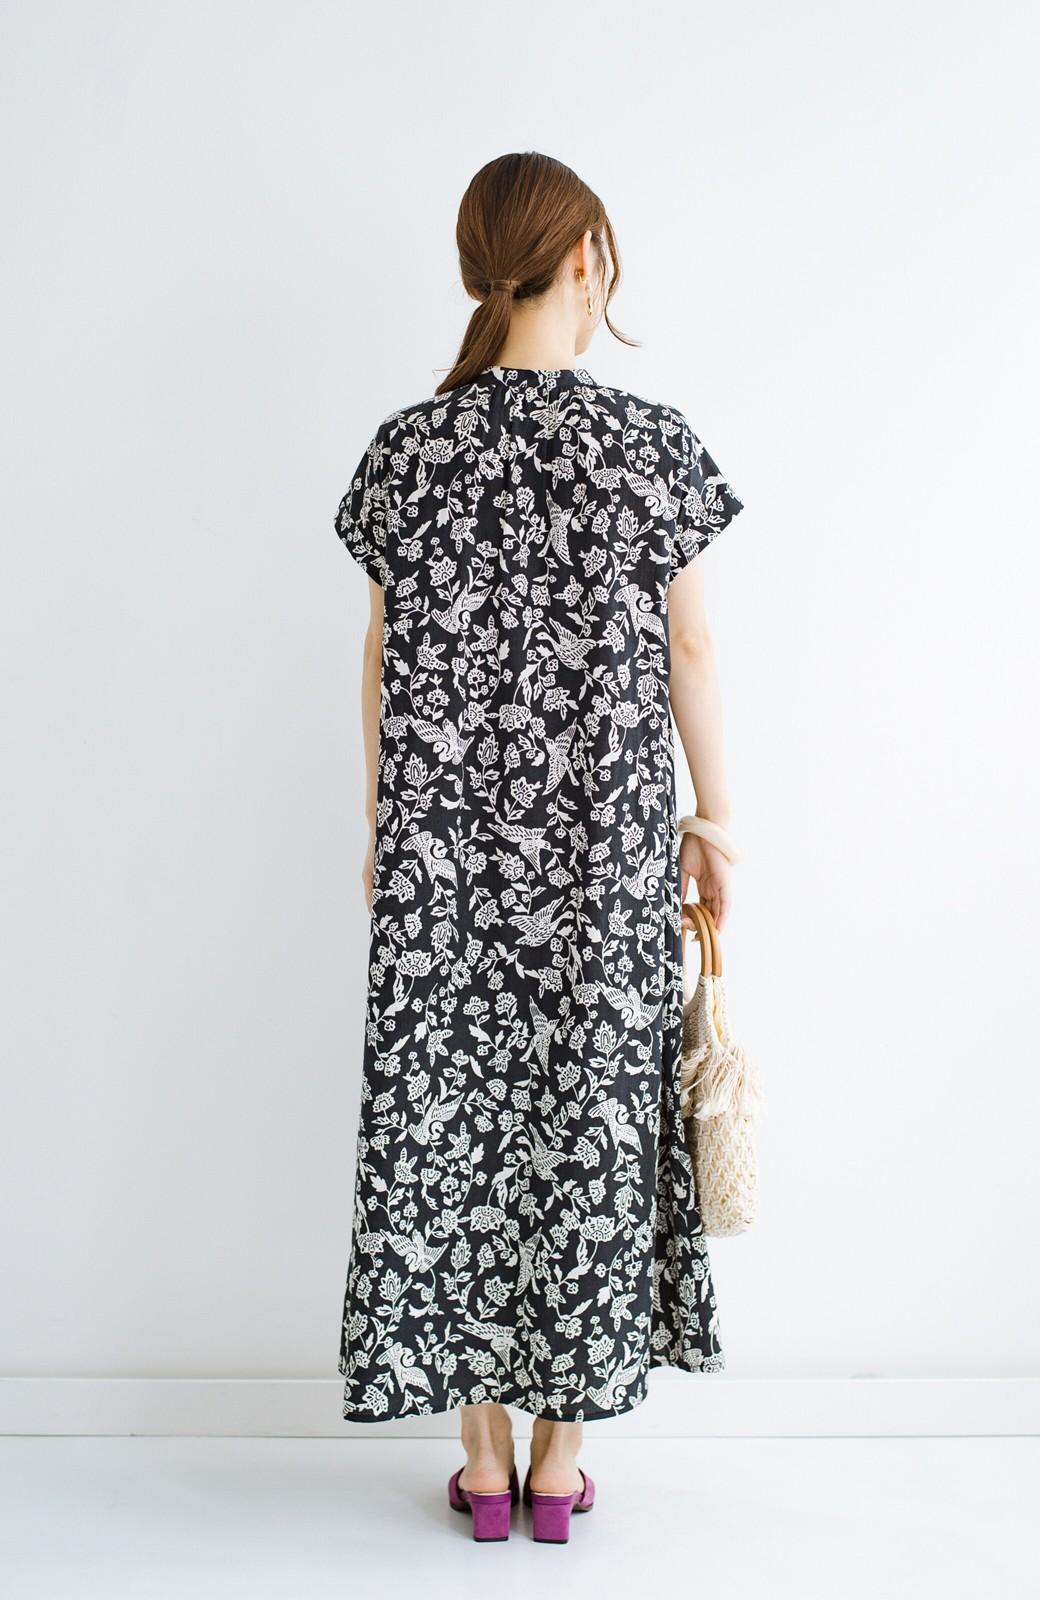 haco! 京都の浴衣屋さんと作った浴衣生地の羽織ってもかわいいロングワンピース <ブラック系その他>の商品写真20